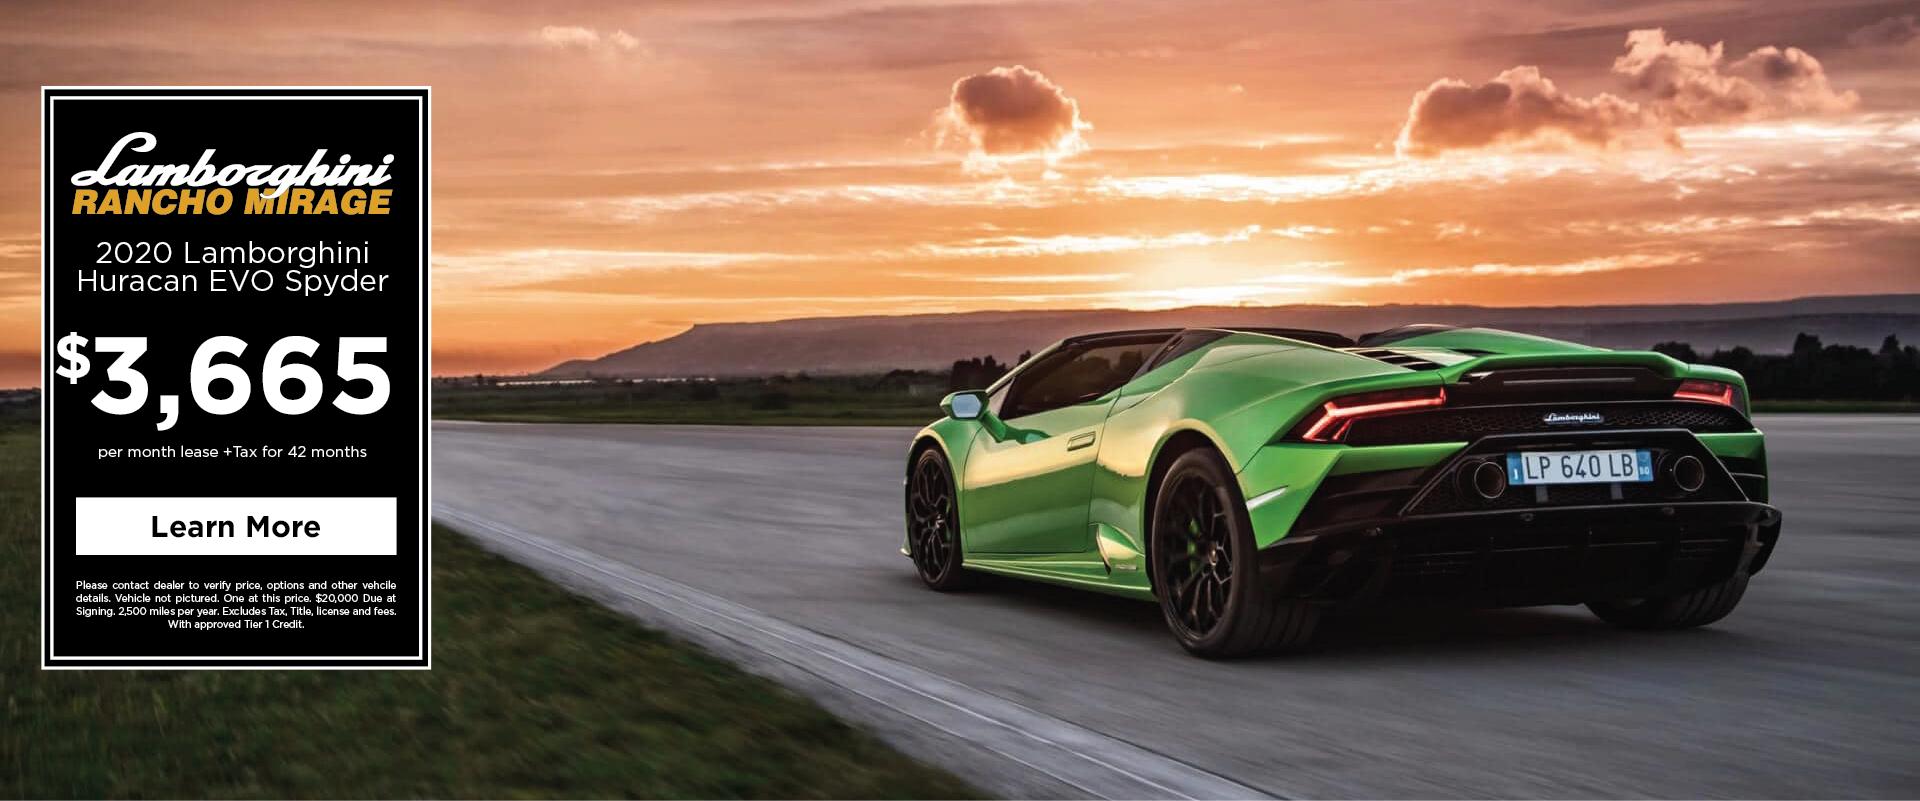 Lamborghini Huracan Lease >> Lamborghini Dealer In Rancho Mirage Ca Used Cars Rancho